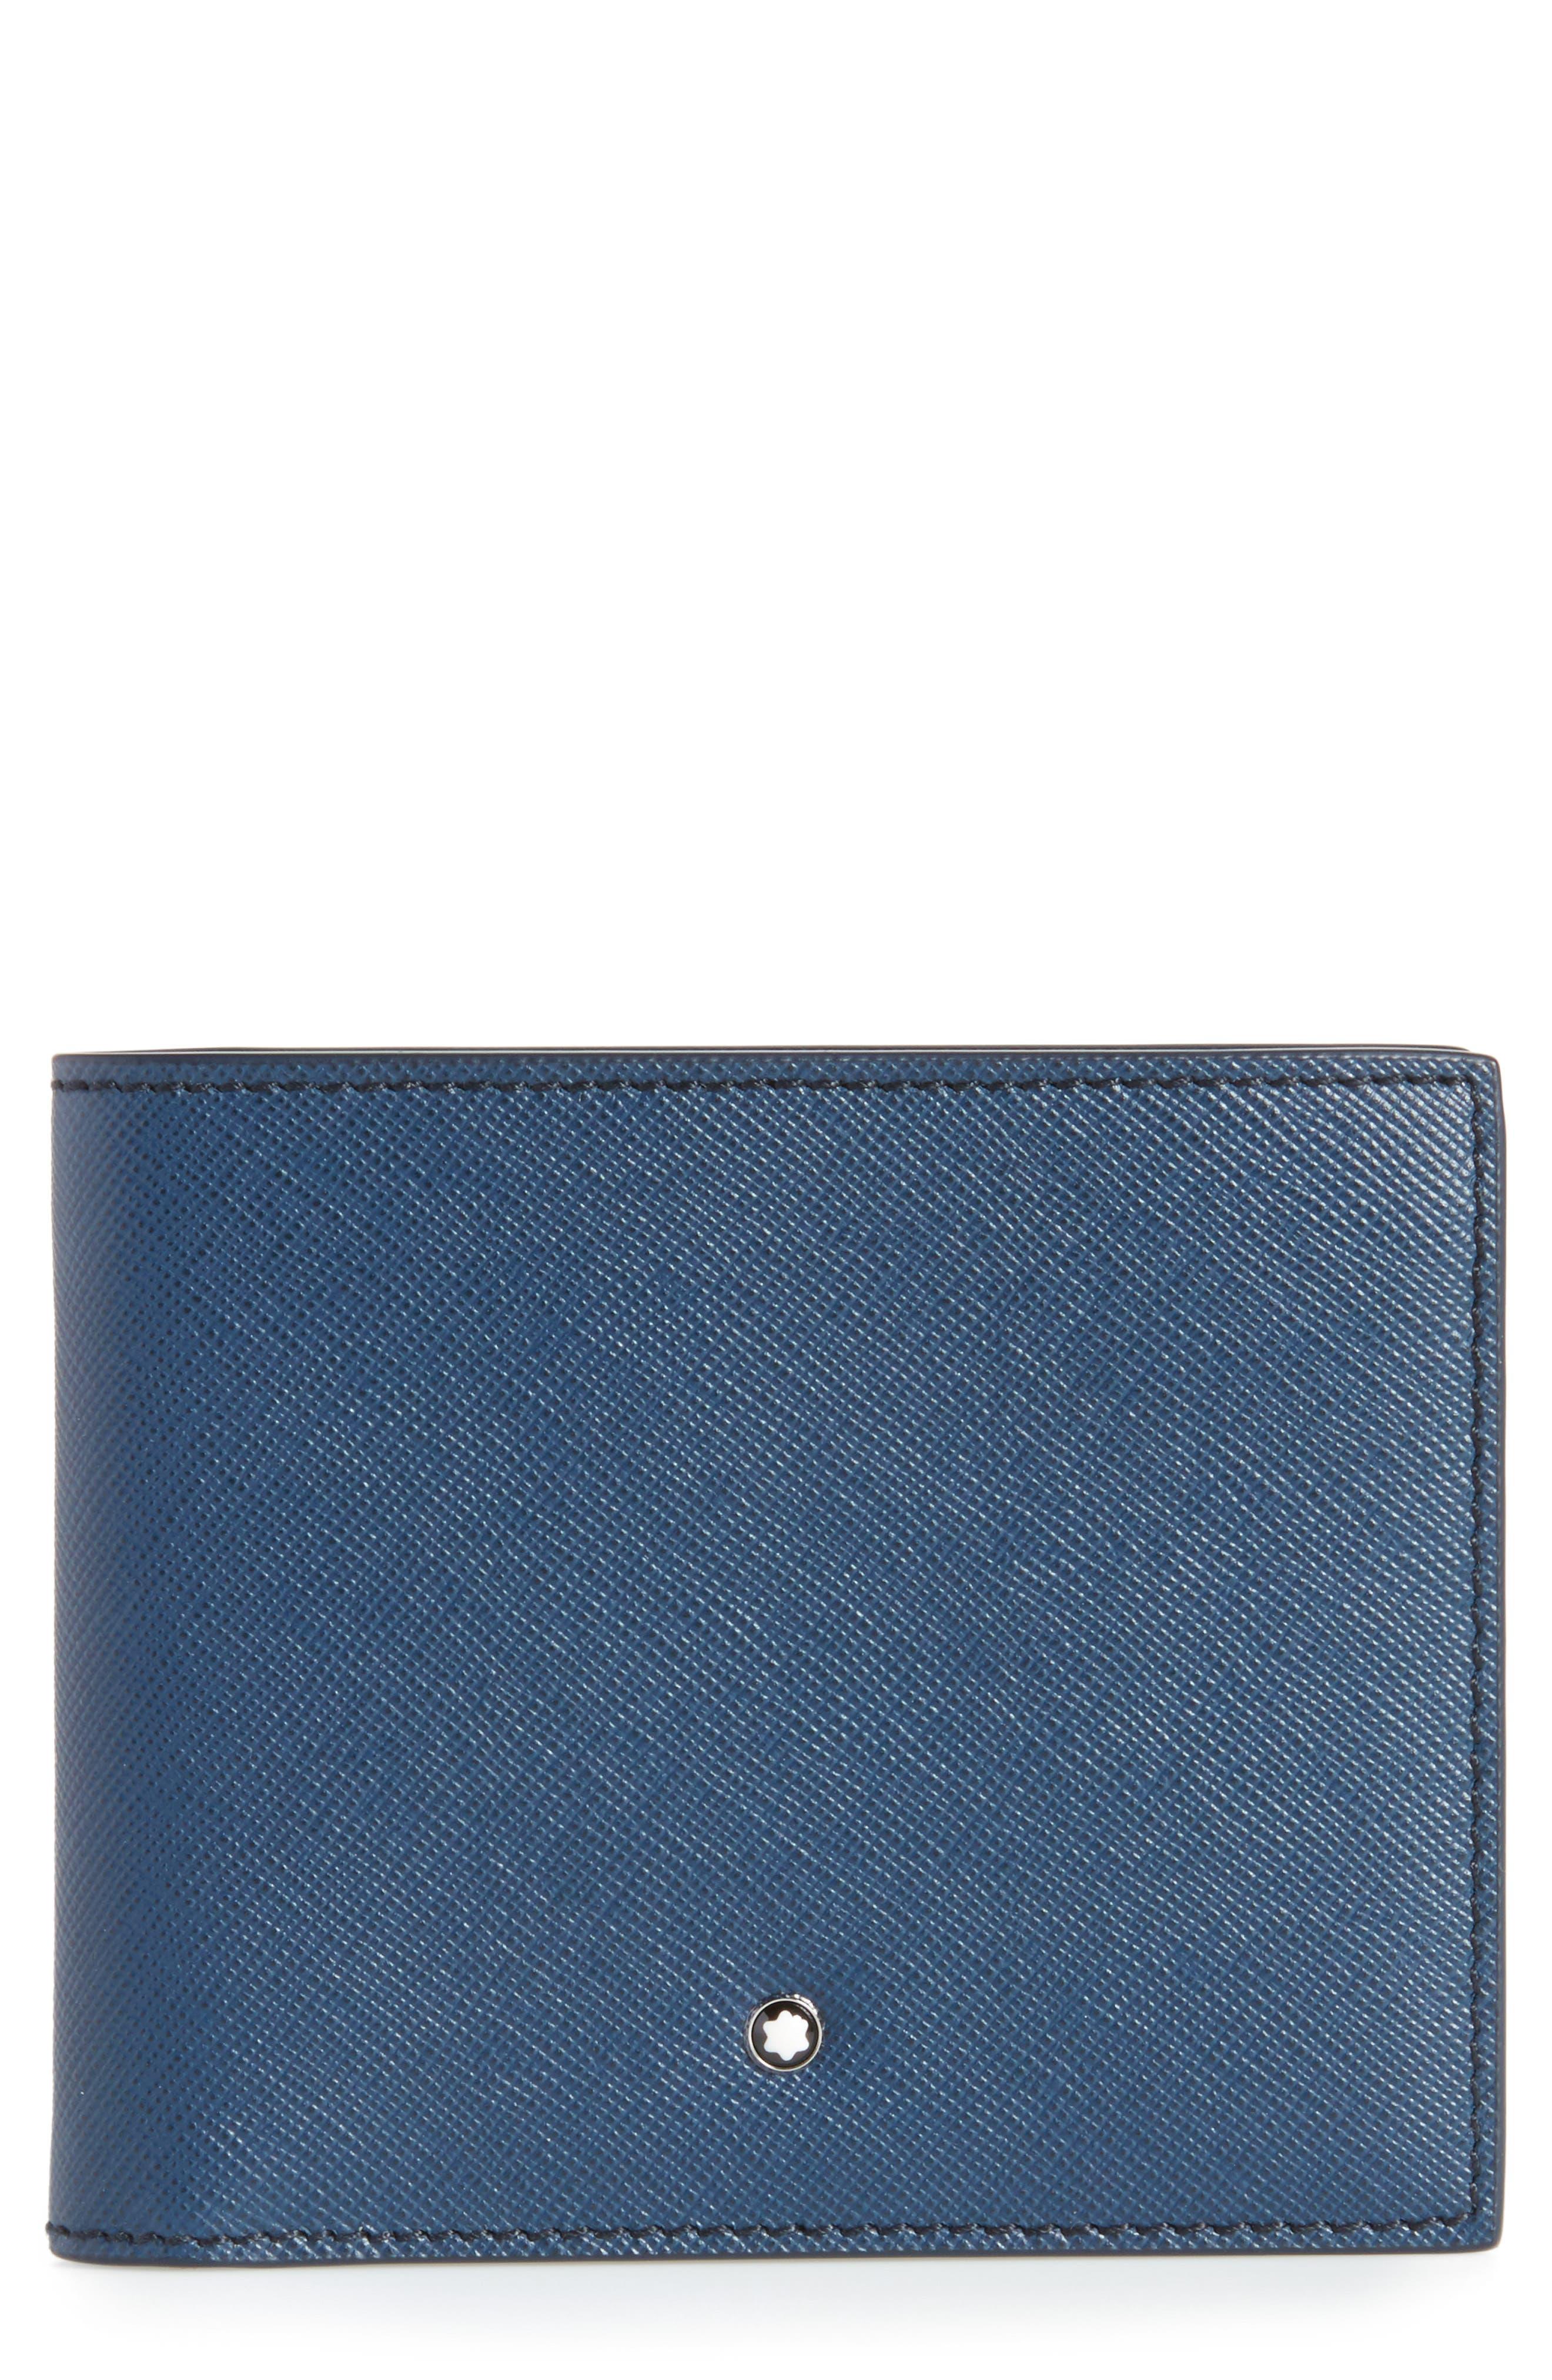 MONTBLANC, Sartorial Leather Wallet, Main thumbnail 1, color, INDIGO